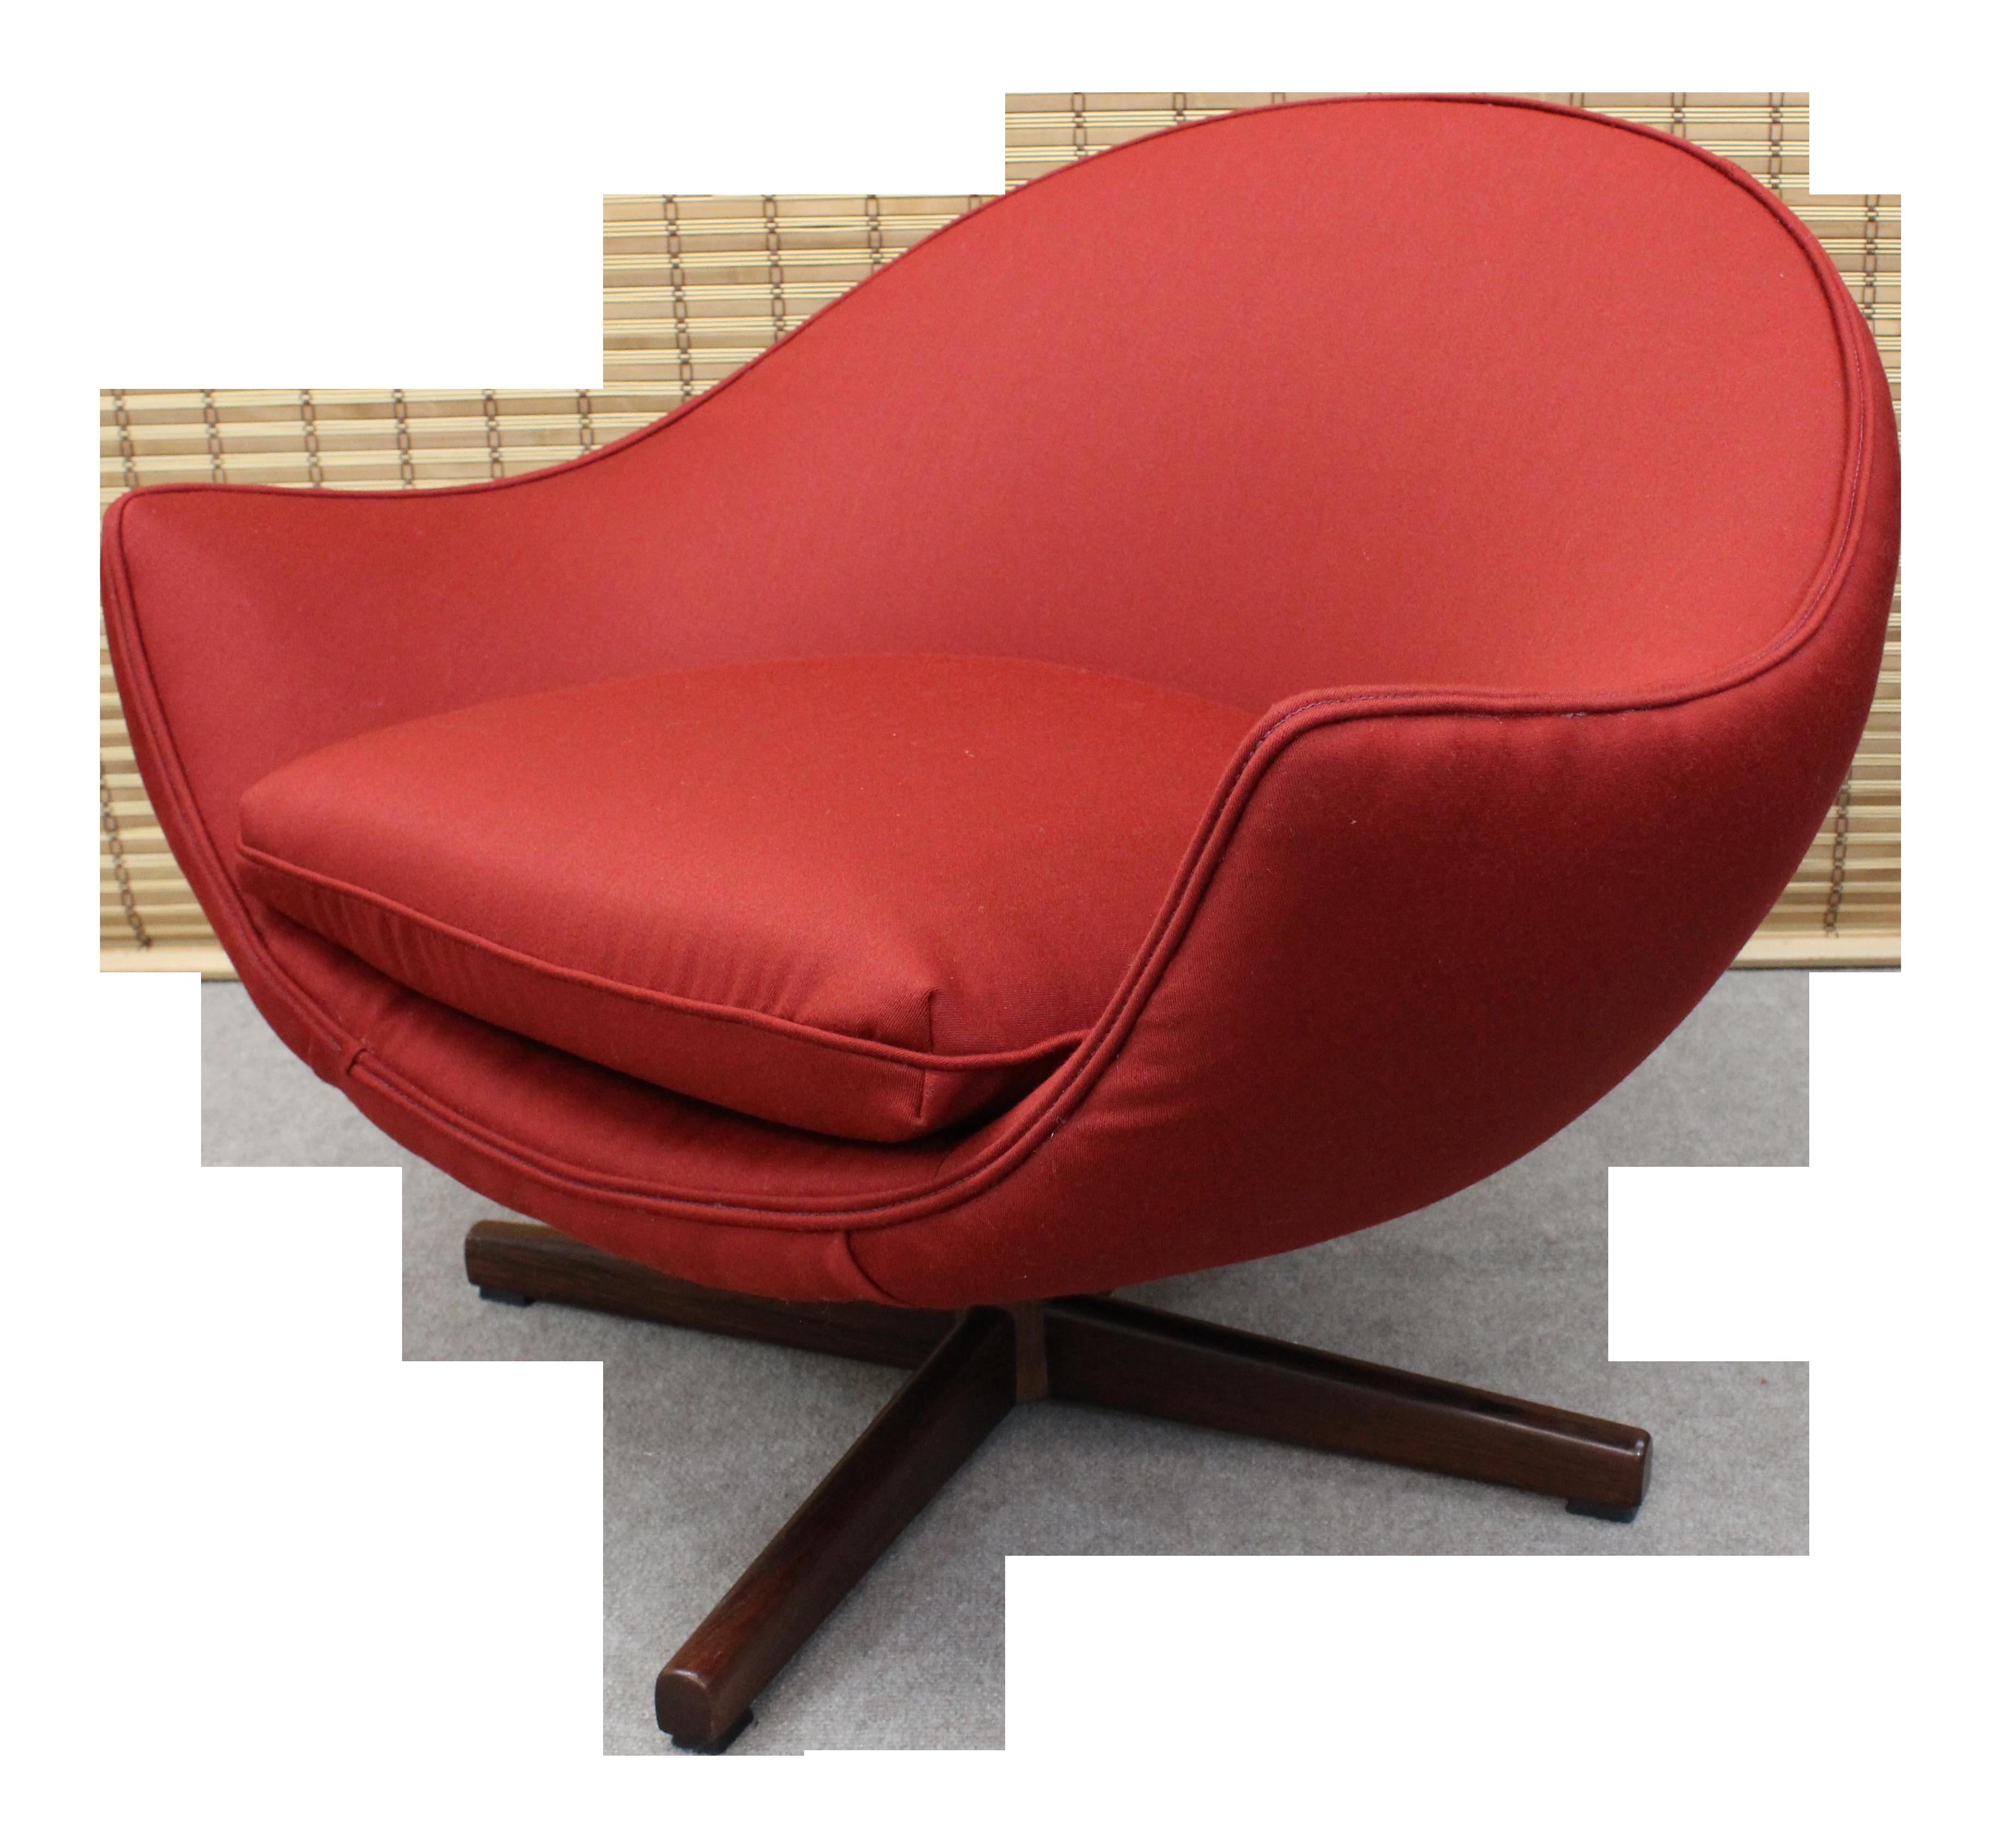 Mobler Vintage Mid Century Modern Scoop Chair